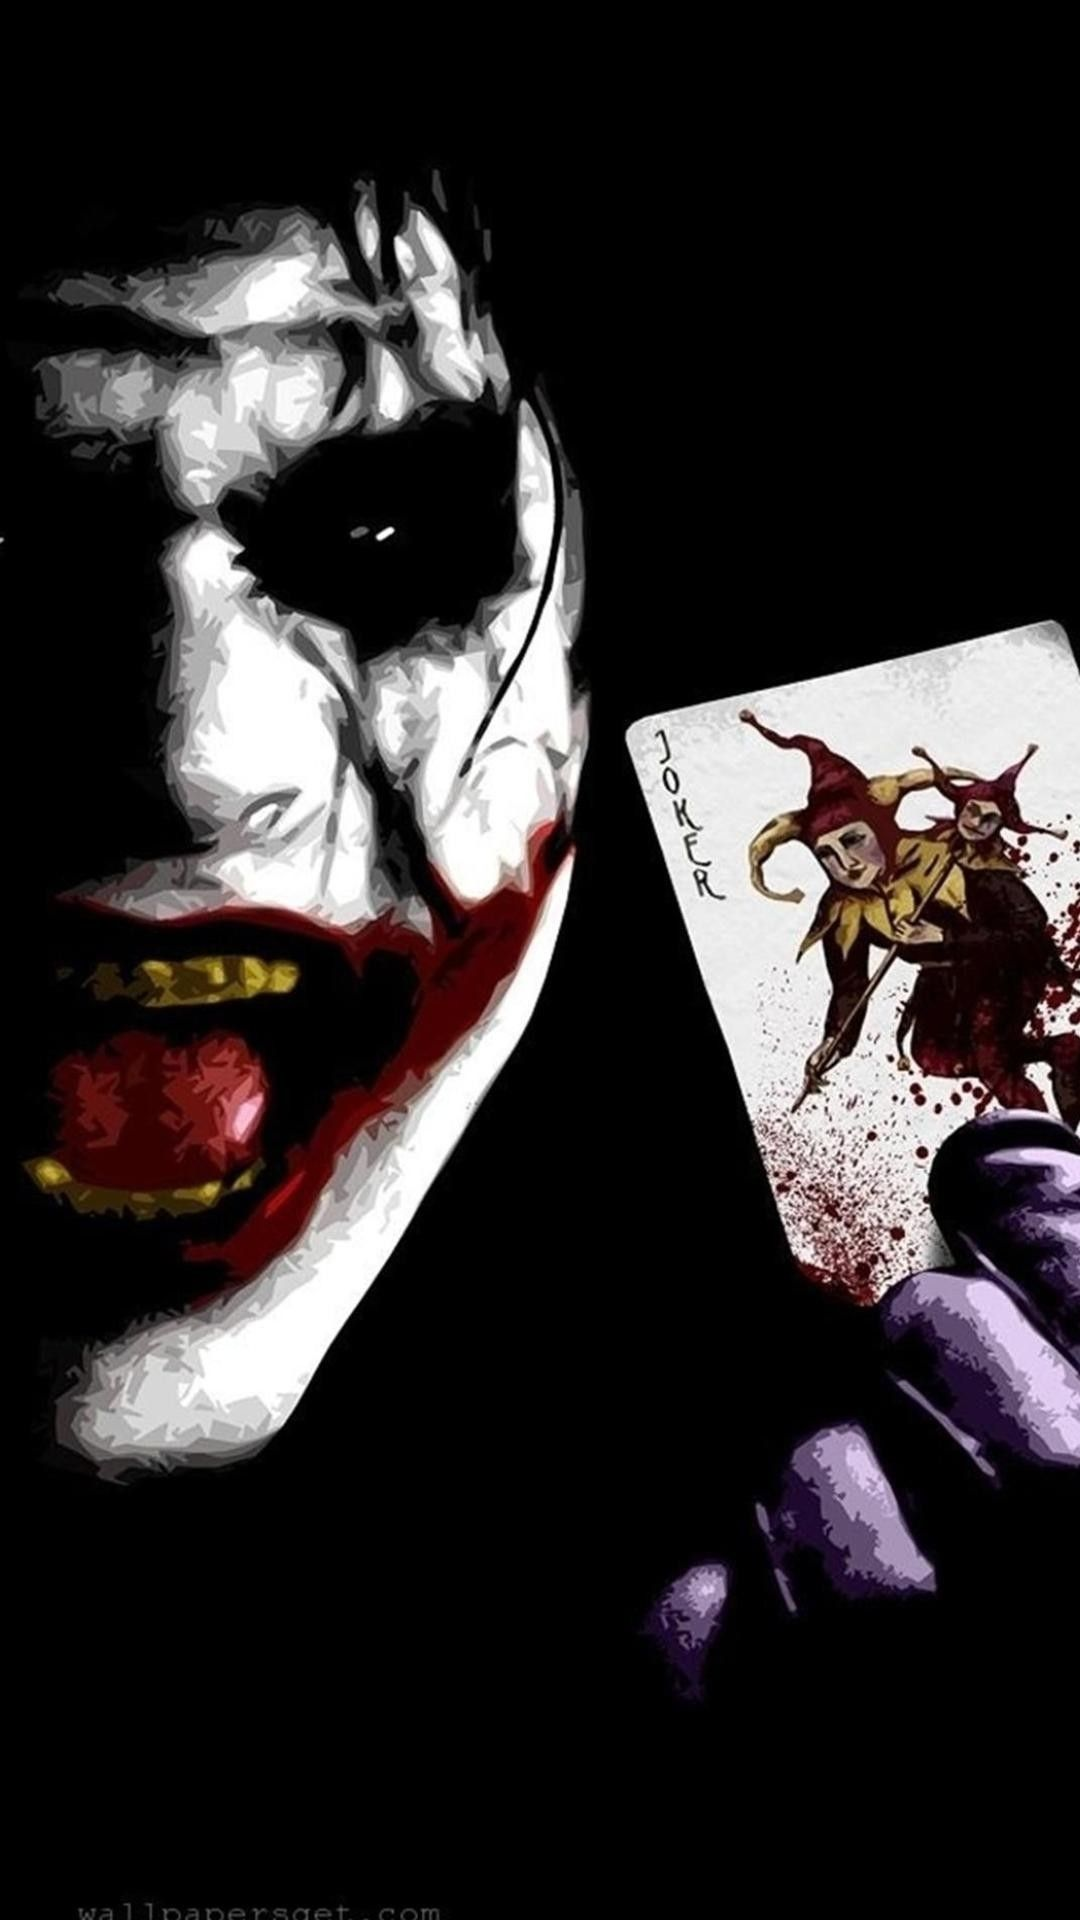 1080x1920 Joker Hd Wallpapers For Iphone Iphone 6 Joker Hd Wallpaper Joker Wallpapers Joker